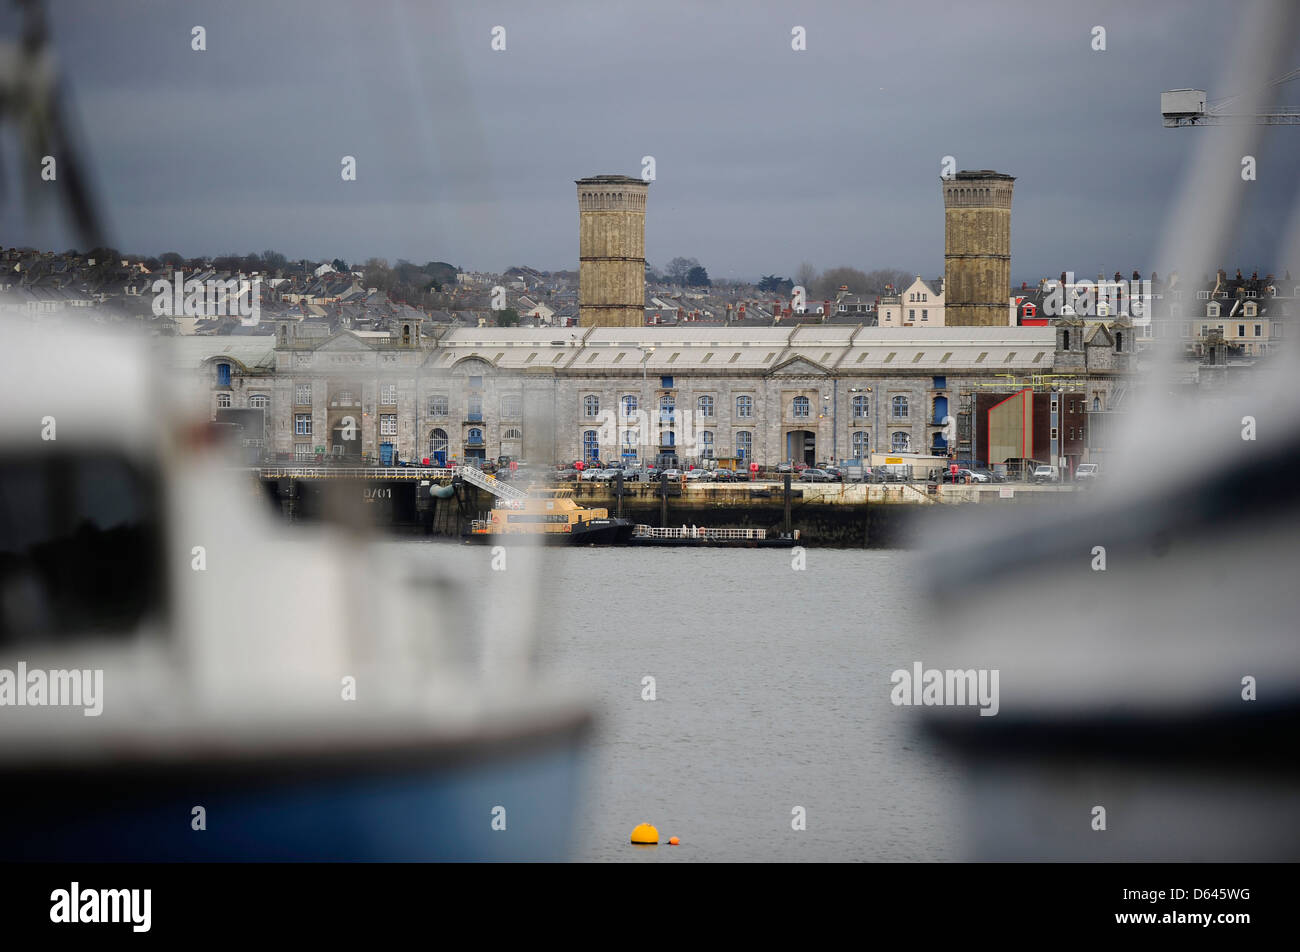 HM Dockyard Devonport, Plymouth, Devon, an MOD site, seen from across the estuary - Stock Image